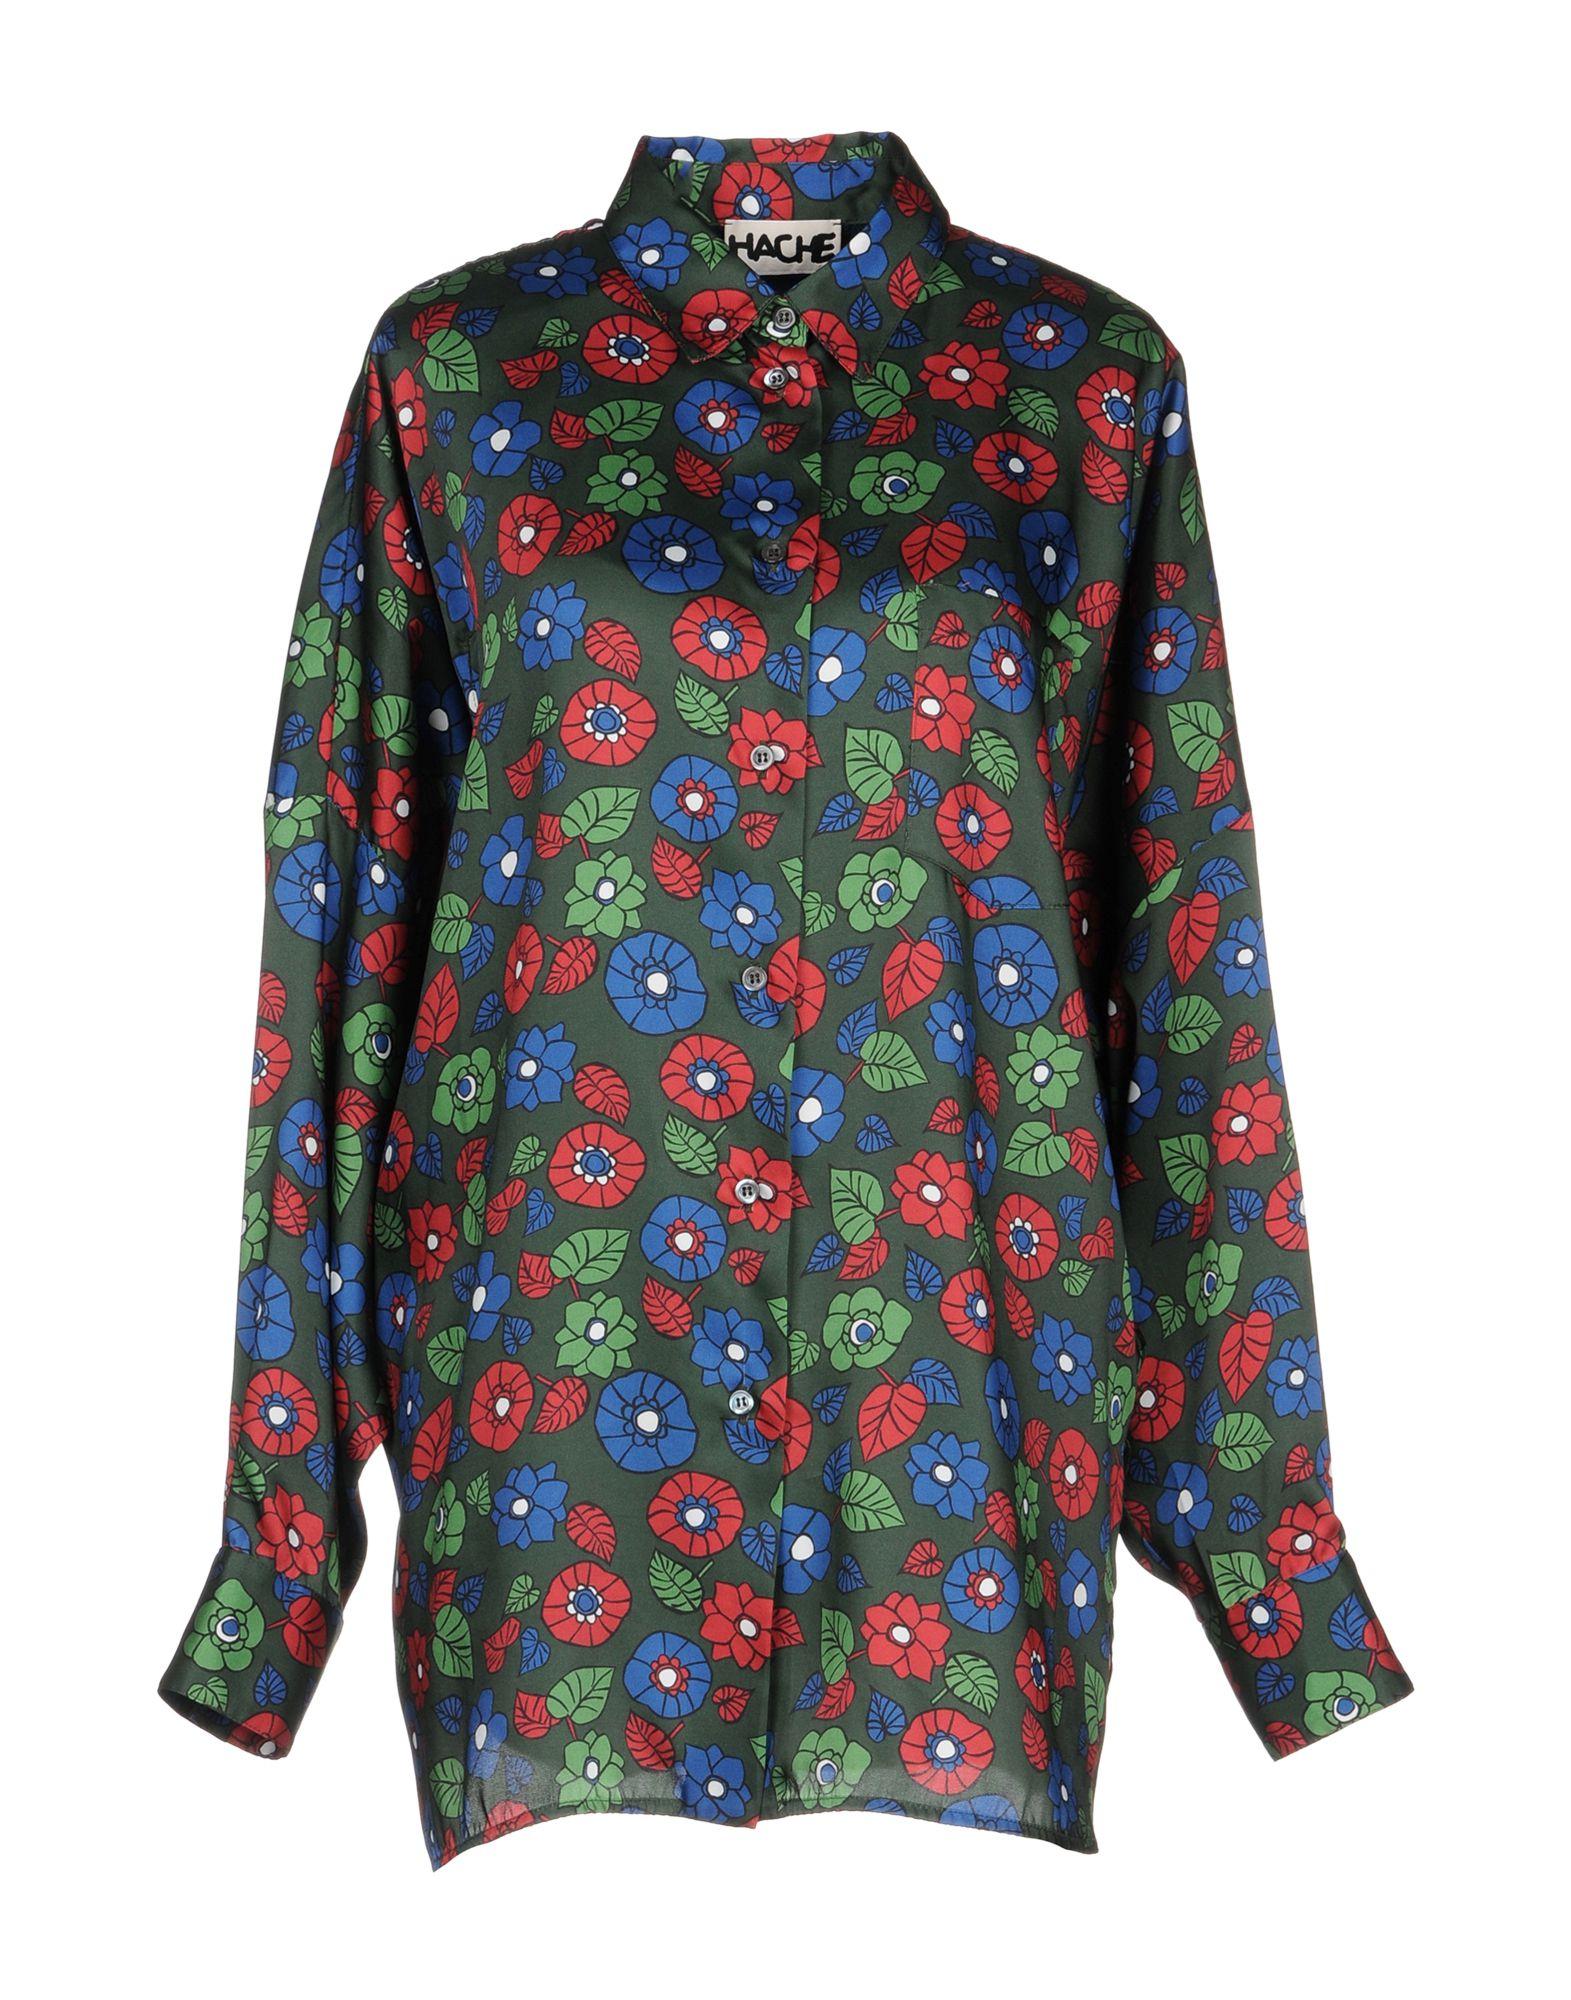 c2bb9e28 hache shirts tops for women - Buy best women's hache shirts tops on ...